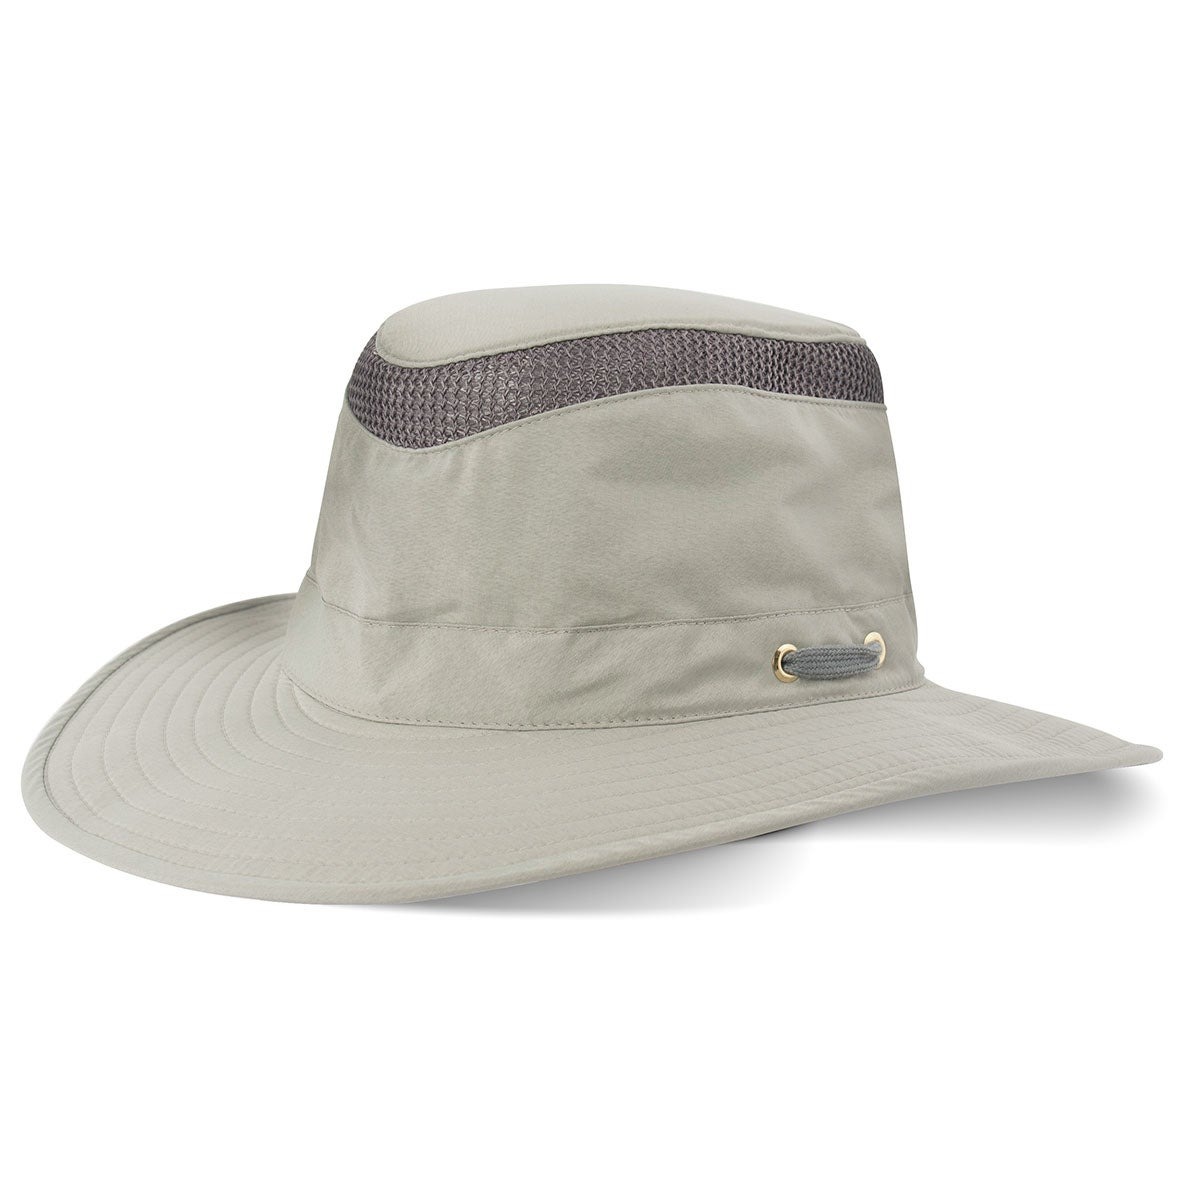 Tilley Airflo® Broad Brim Outback - Rock Face/7 3/8